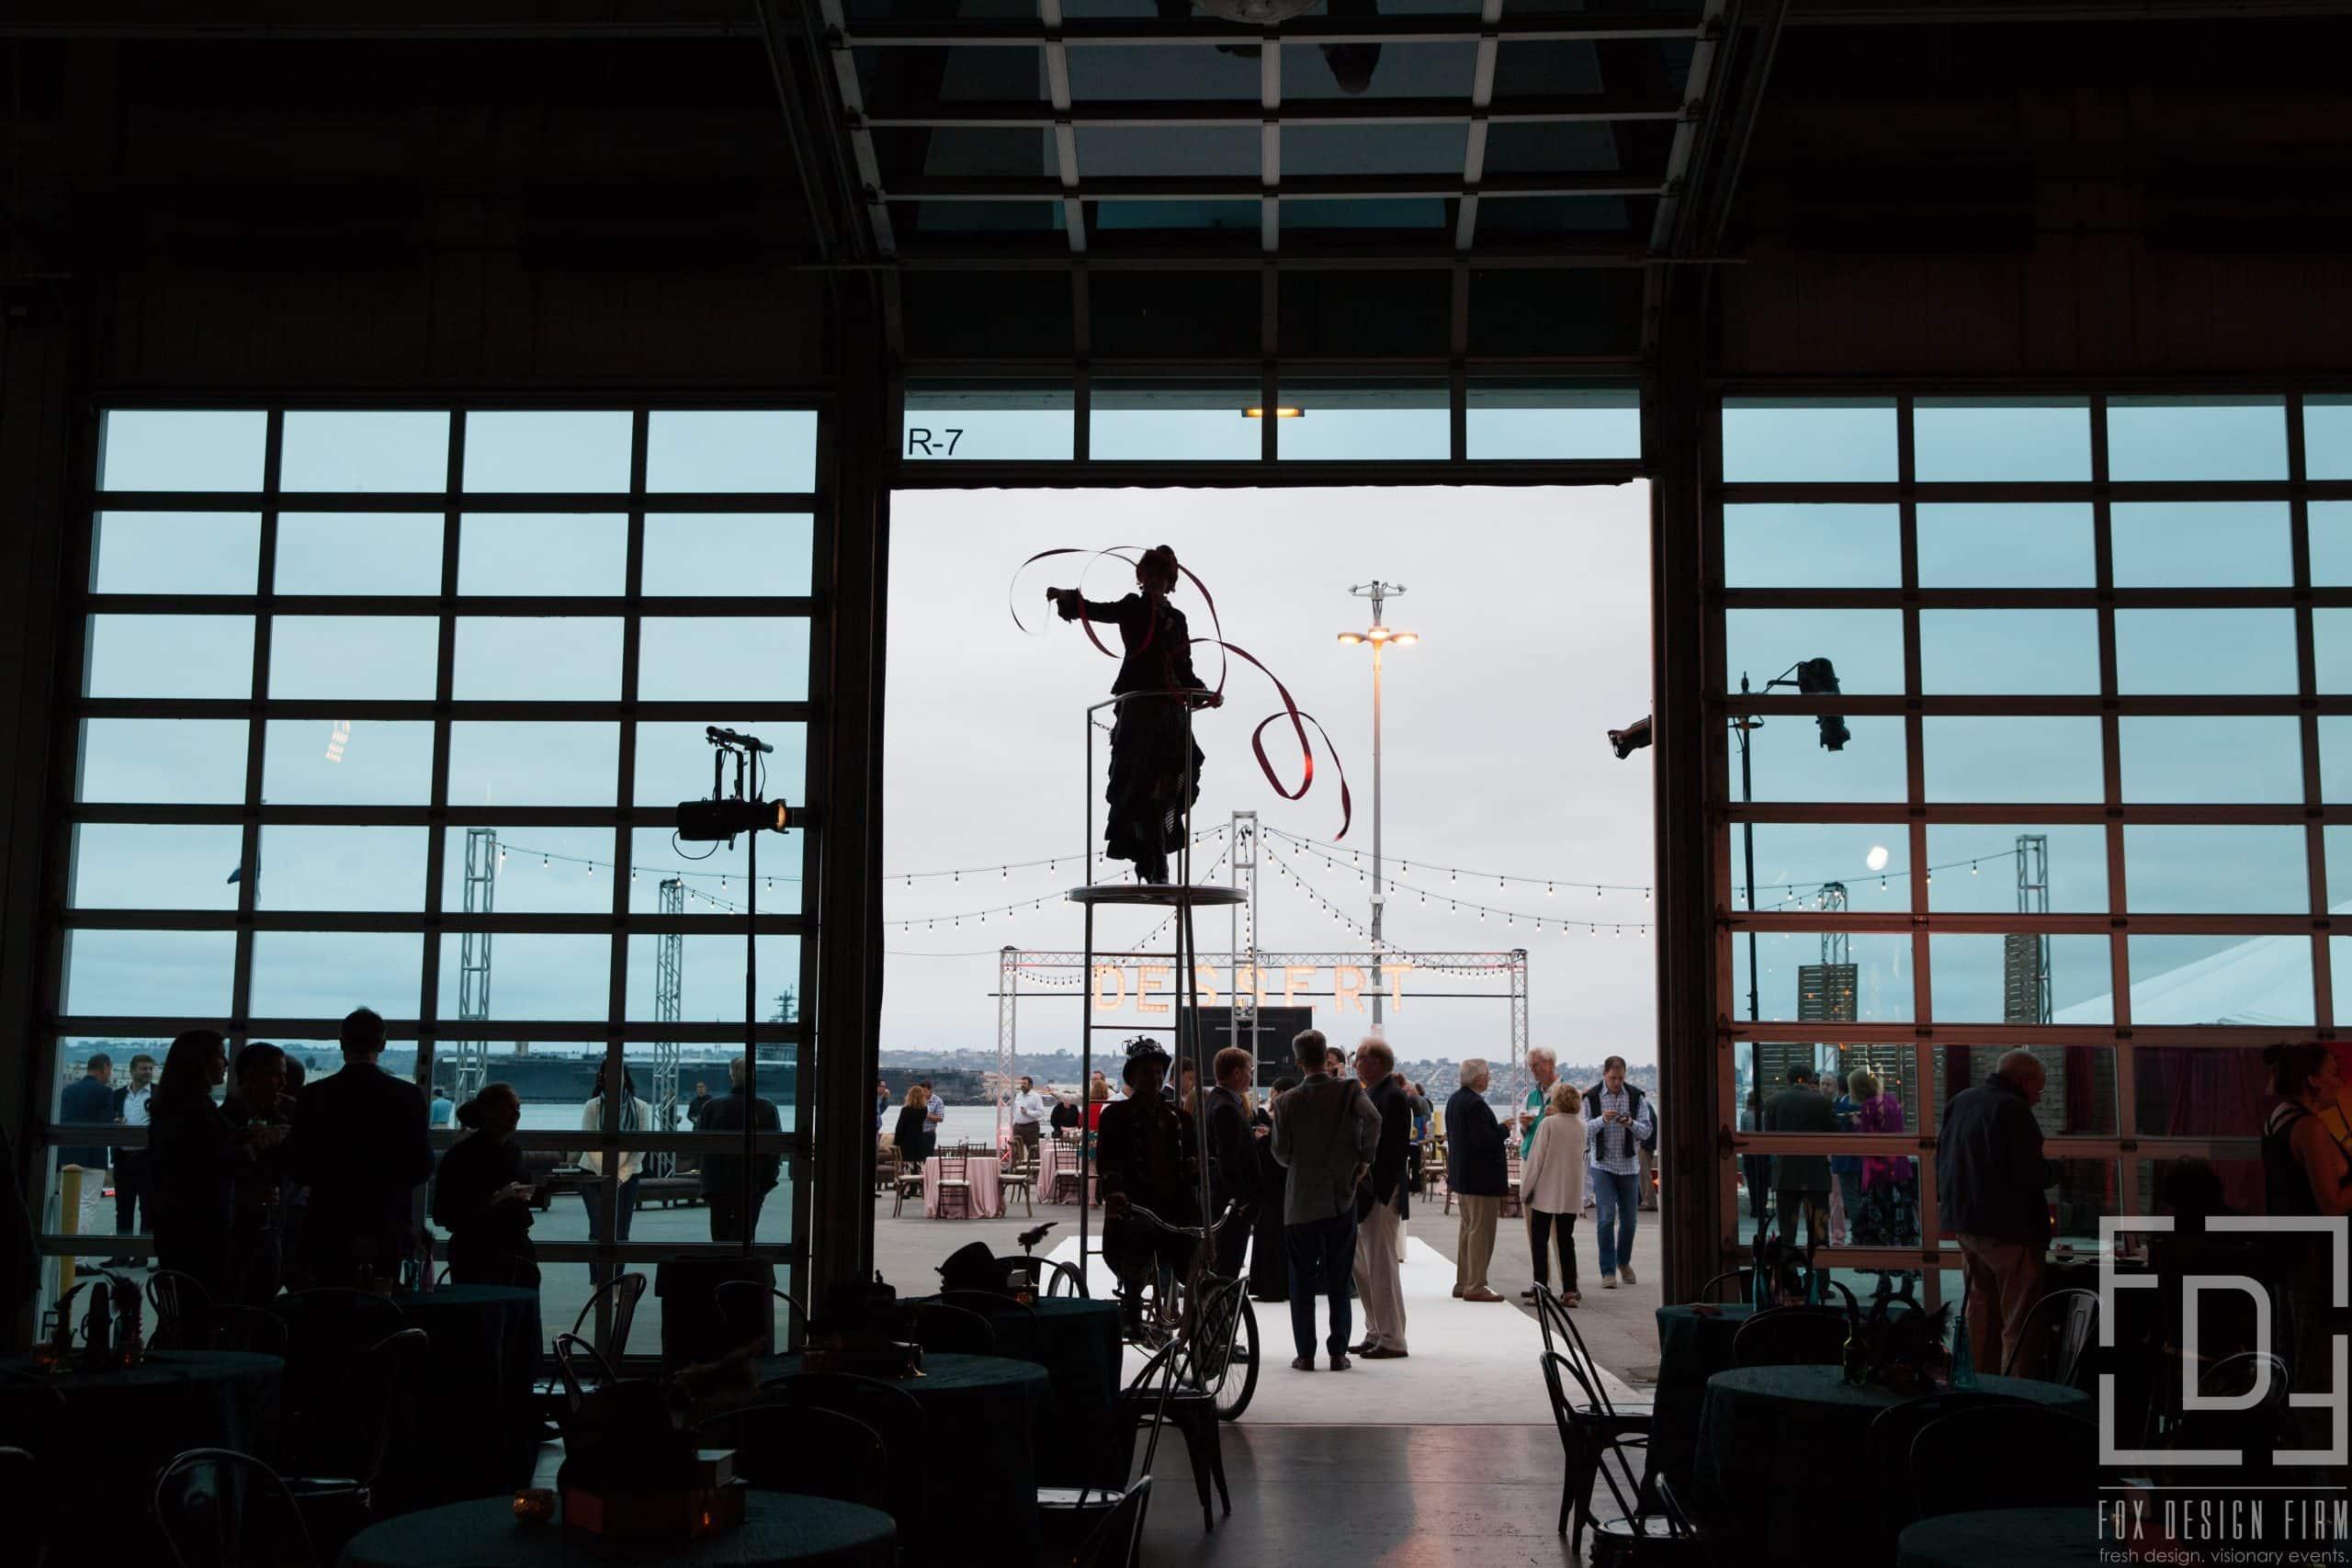 San Diego event photographer Broadway Pier Embarcadero Steampunk Theme Circus Artists